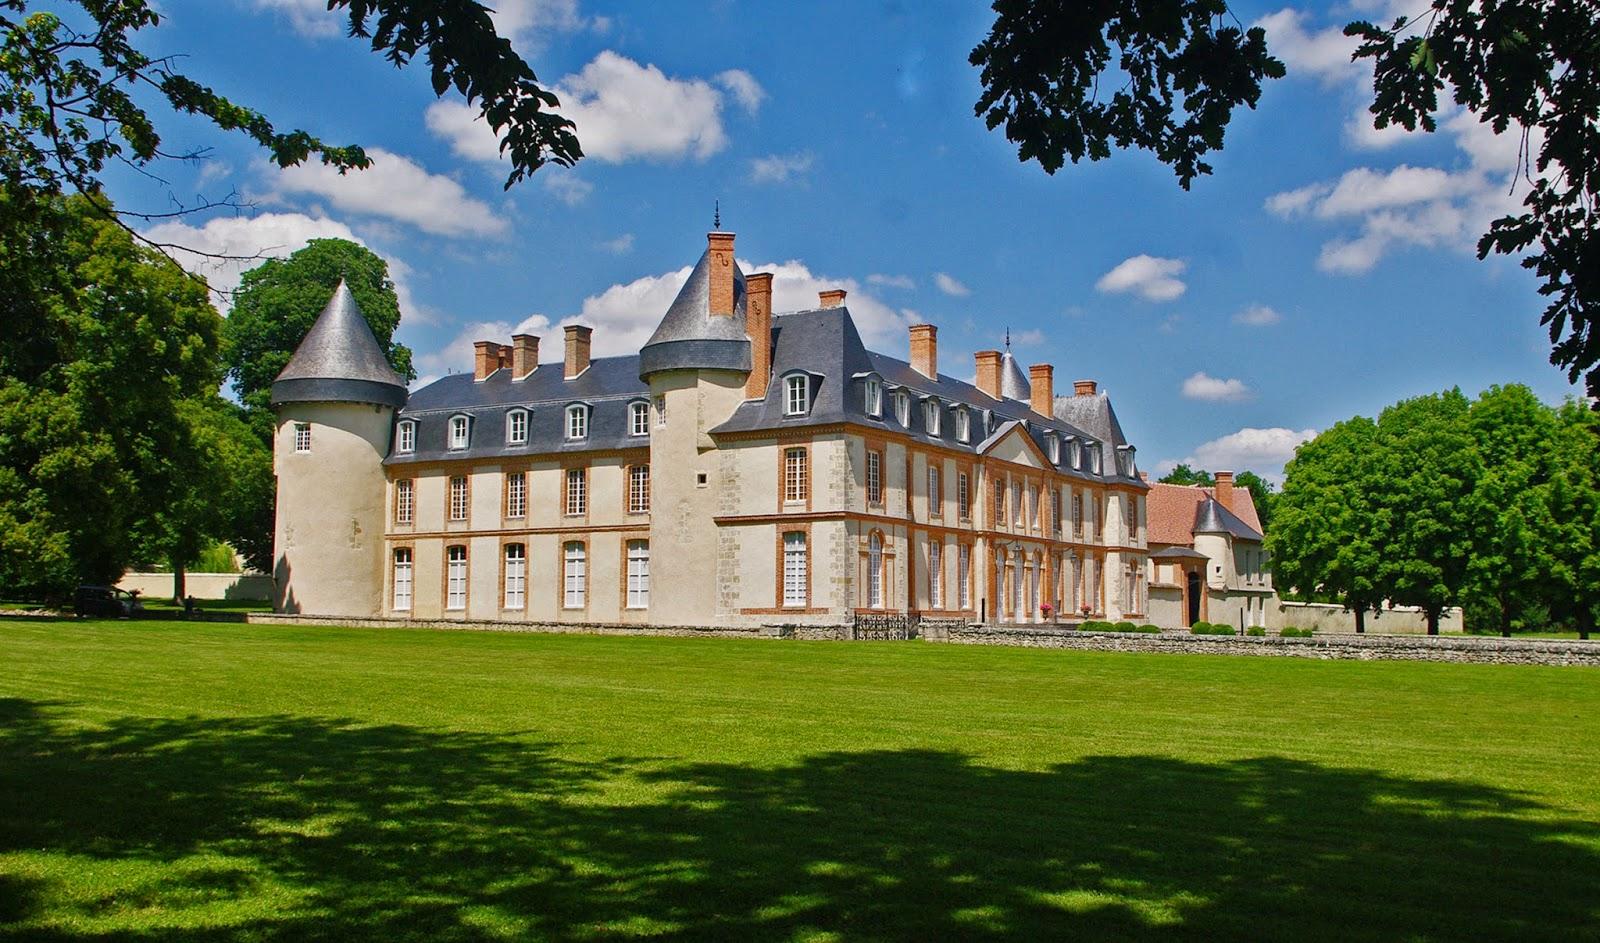 château de rambouillet GR1